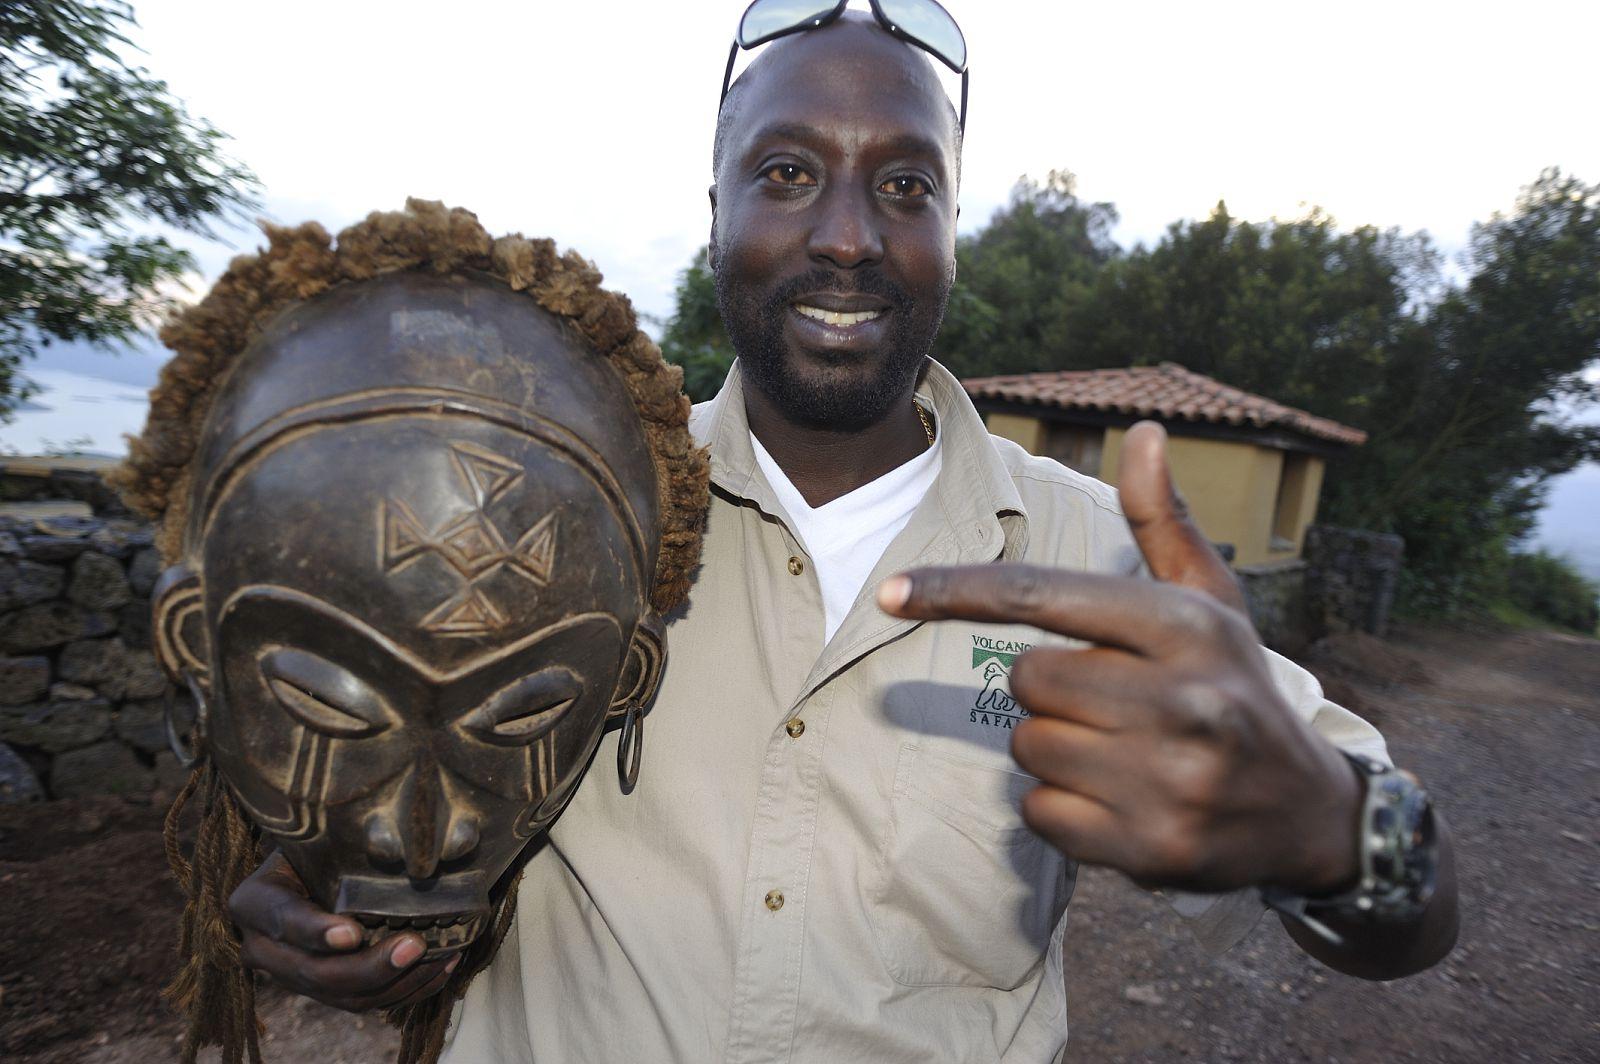 Amon Holding an African sculpture.